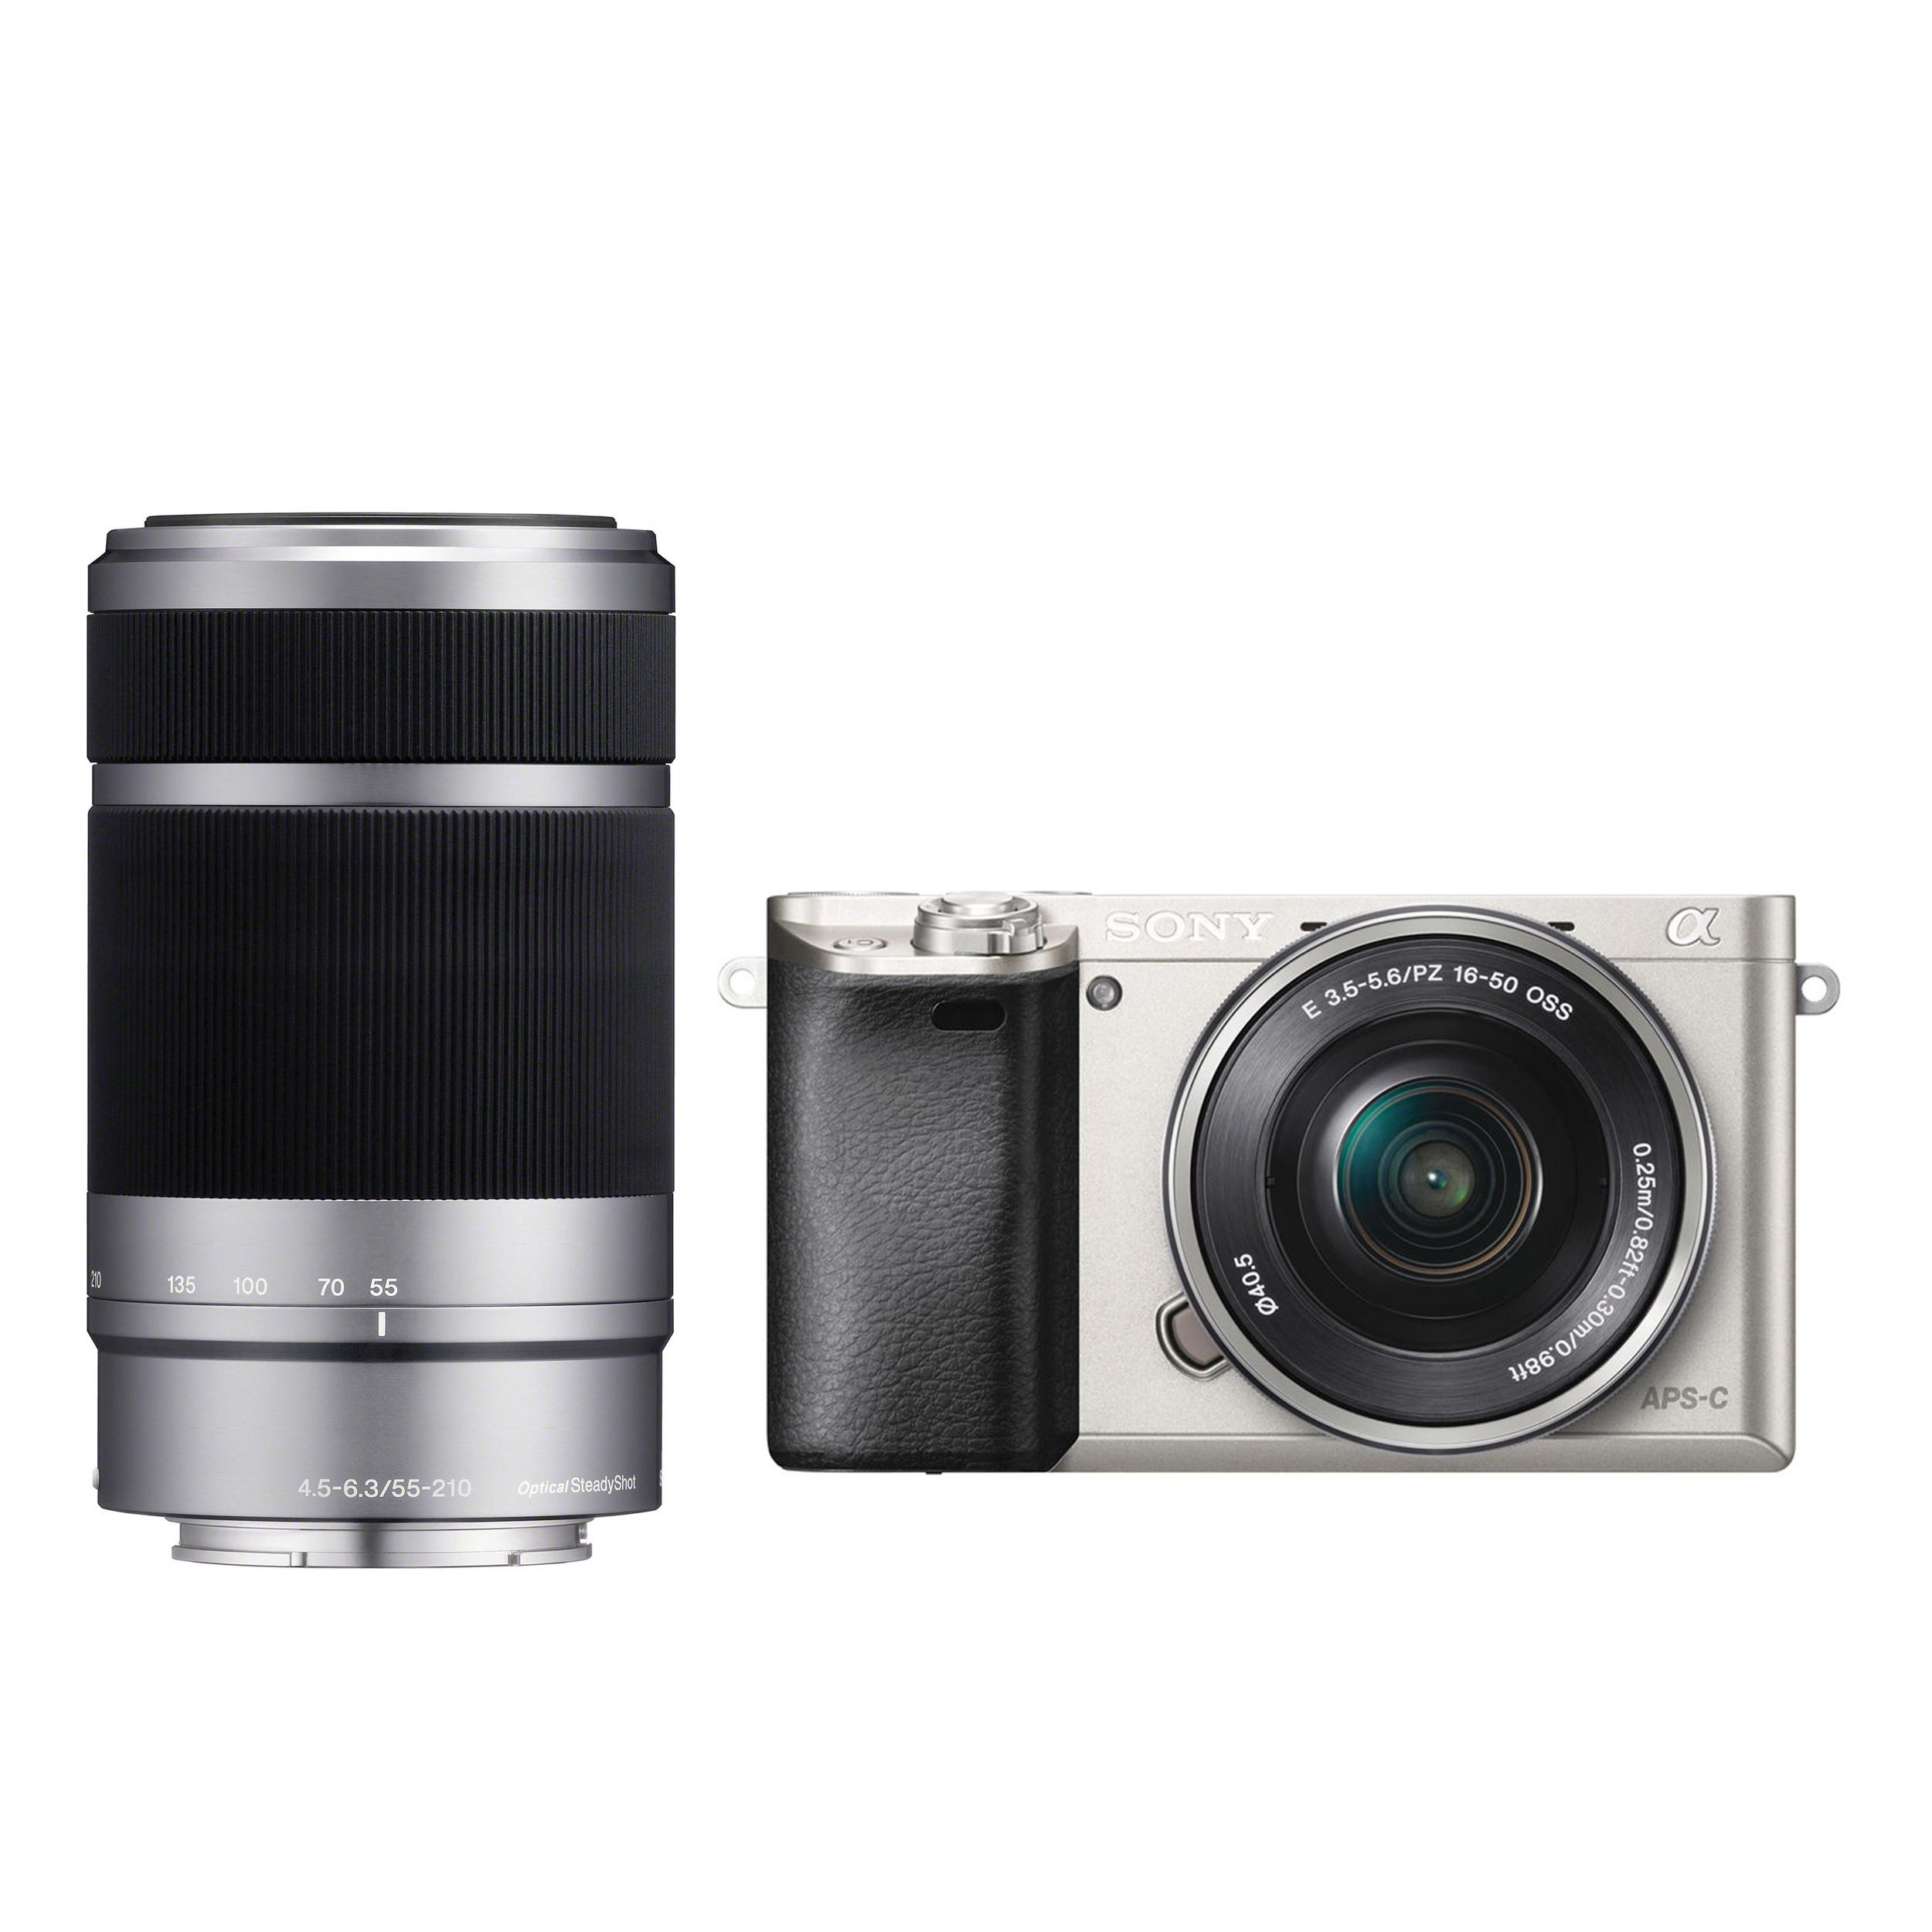 Фотоаппарат Sony Alpha 6000 Double Kit 16-50 + 55-210mm Silver